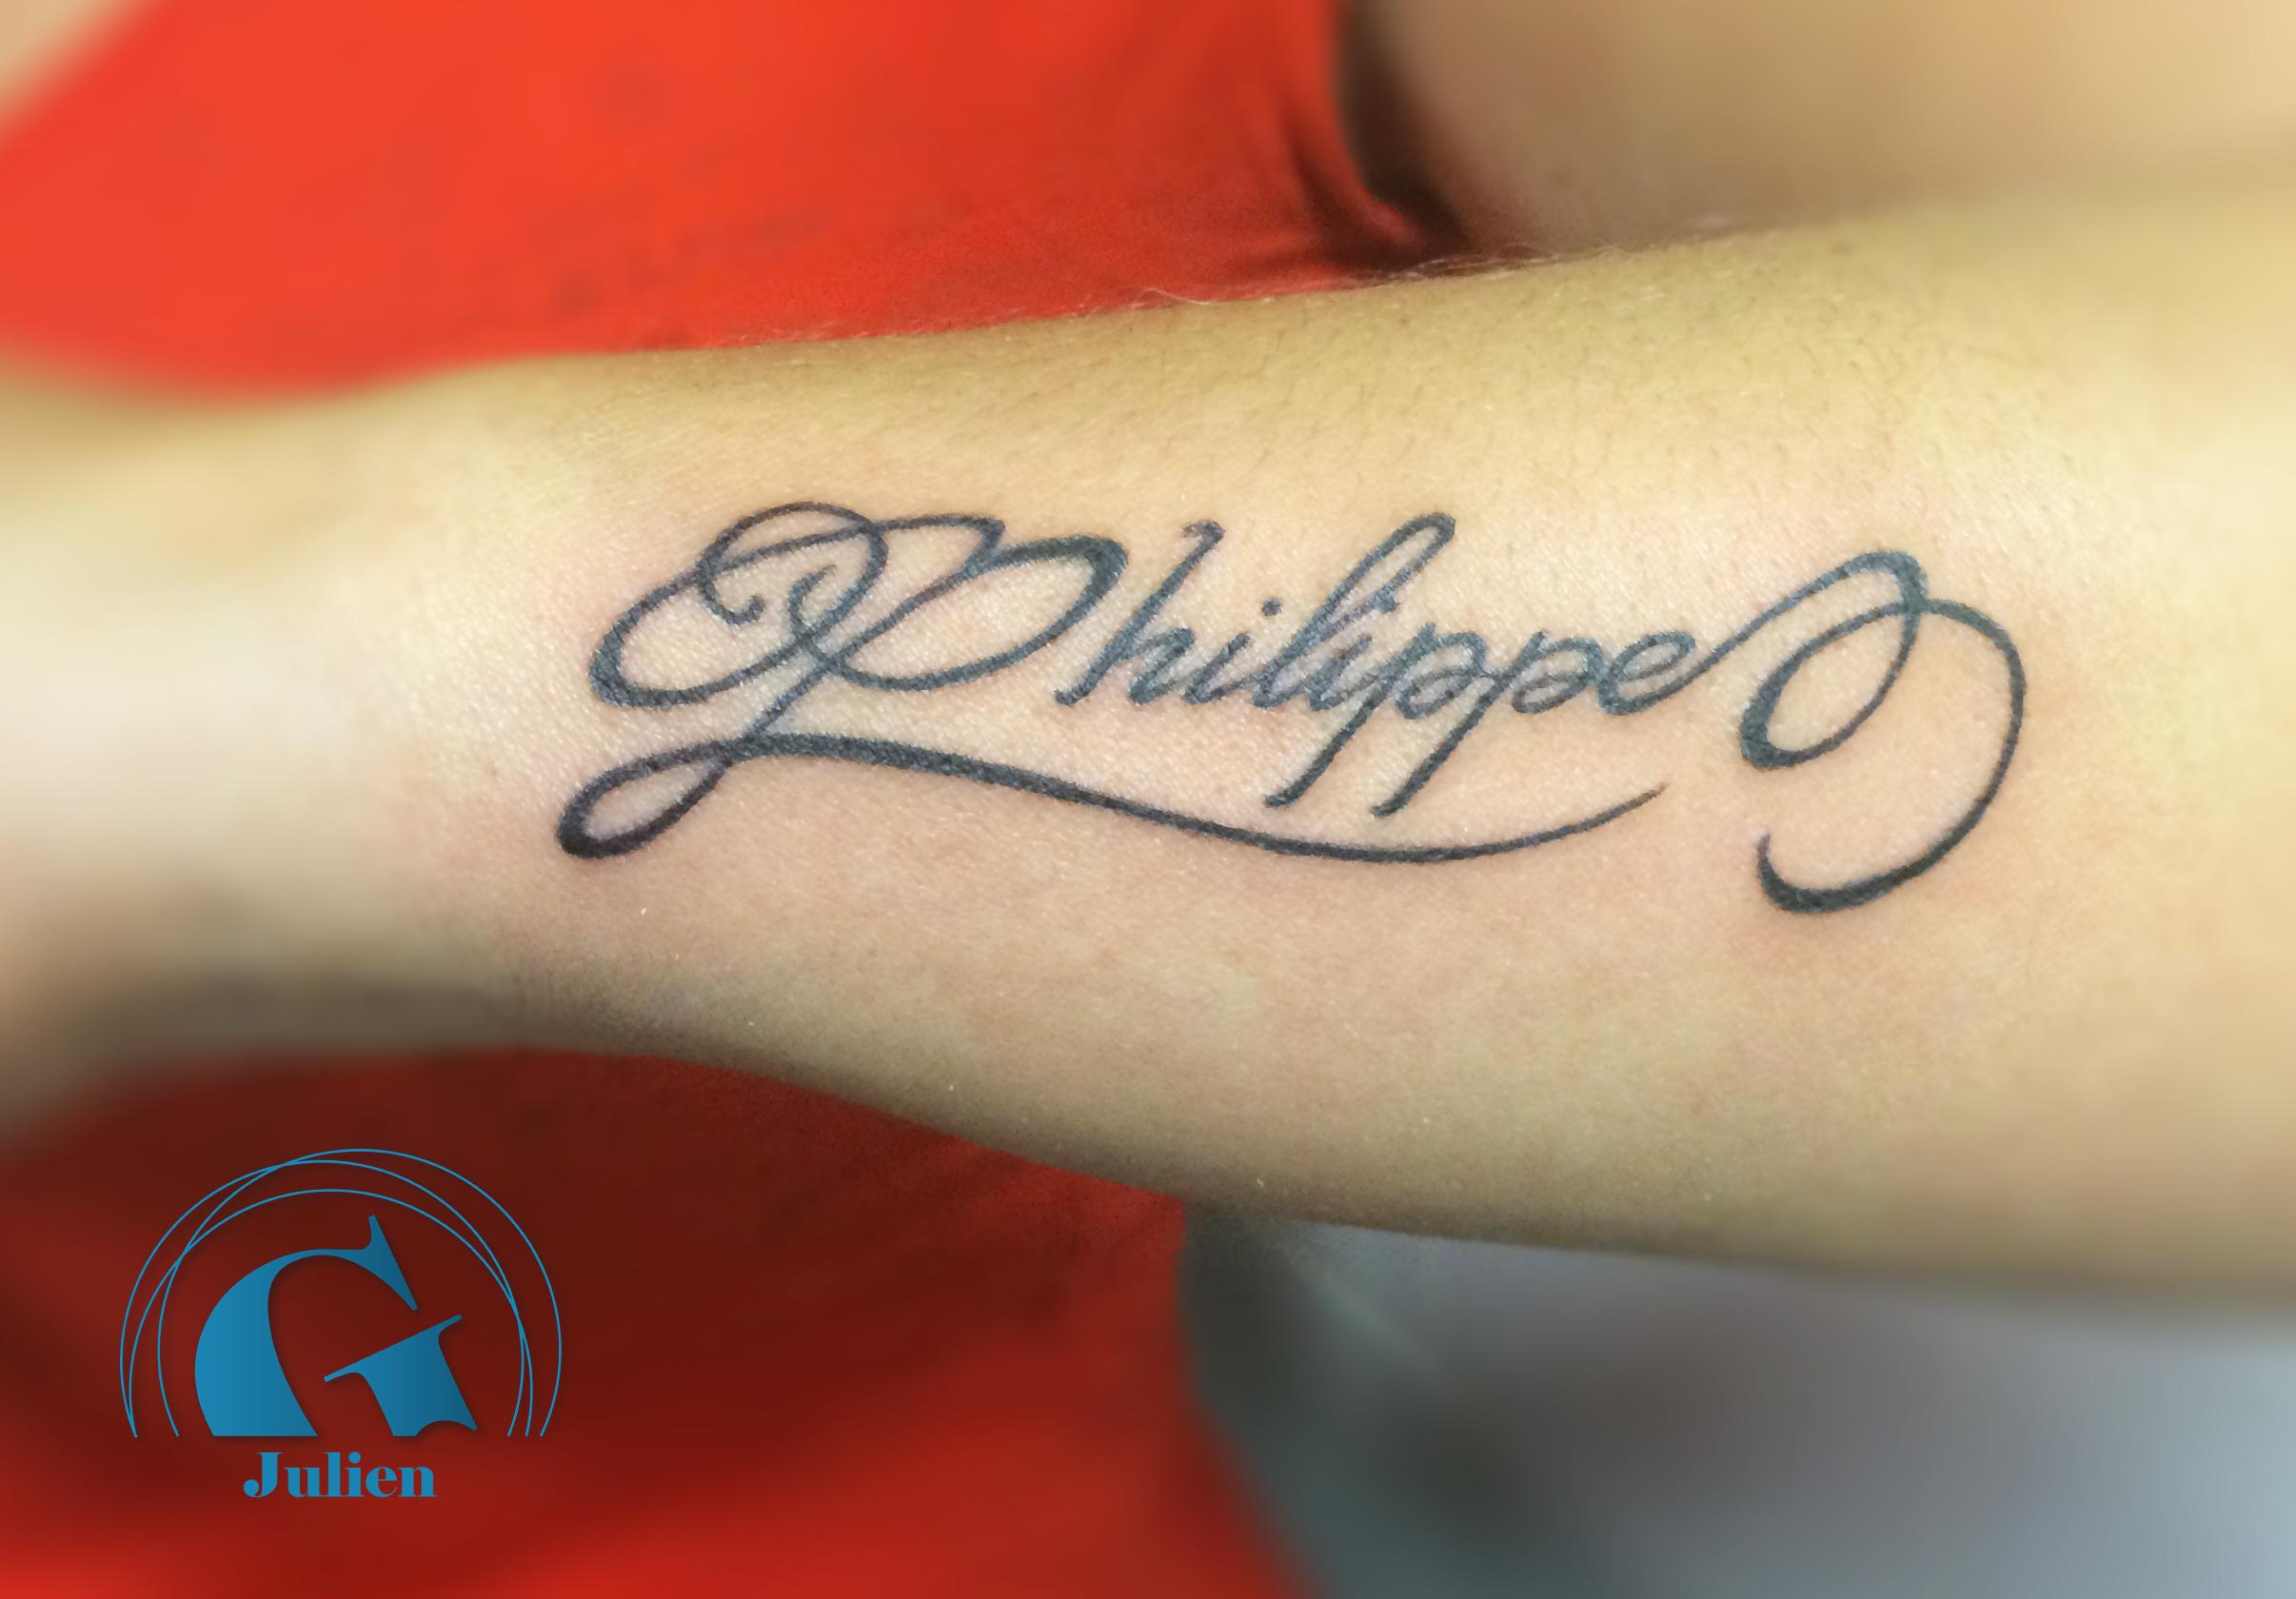 Tatouage ecriture avant bras homme galerie tatouage - Tatouage prenom avant bras ...